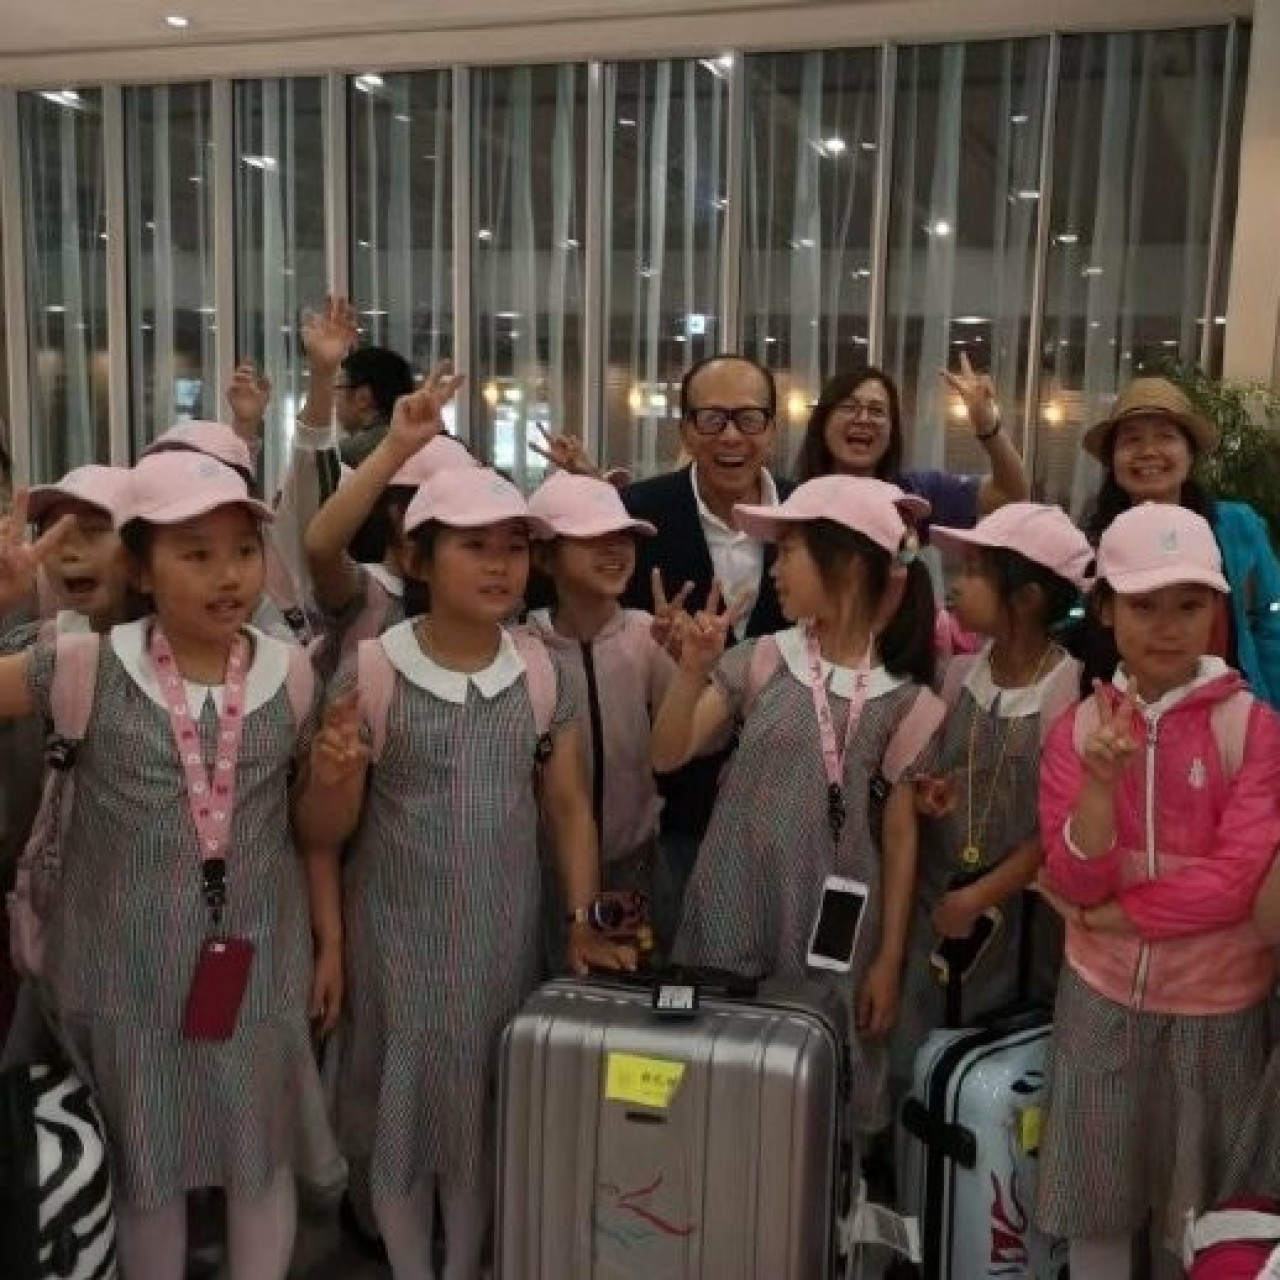 Hong Kong tycoon Li Ka-shing's influence threatened at Shantou